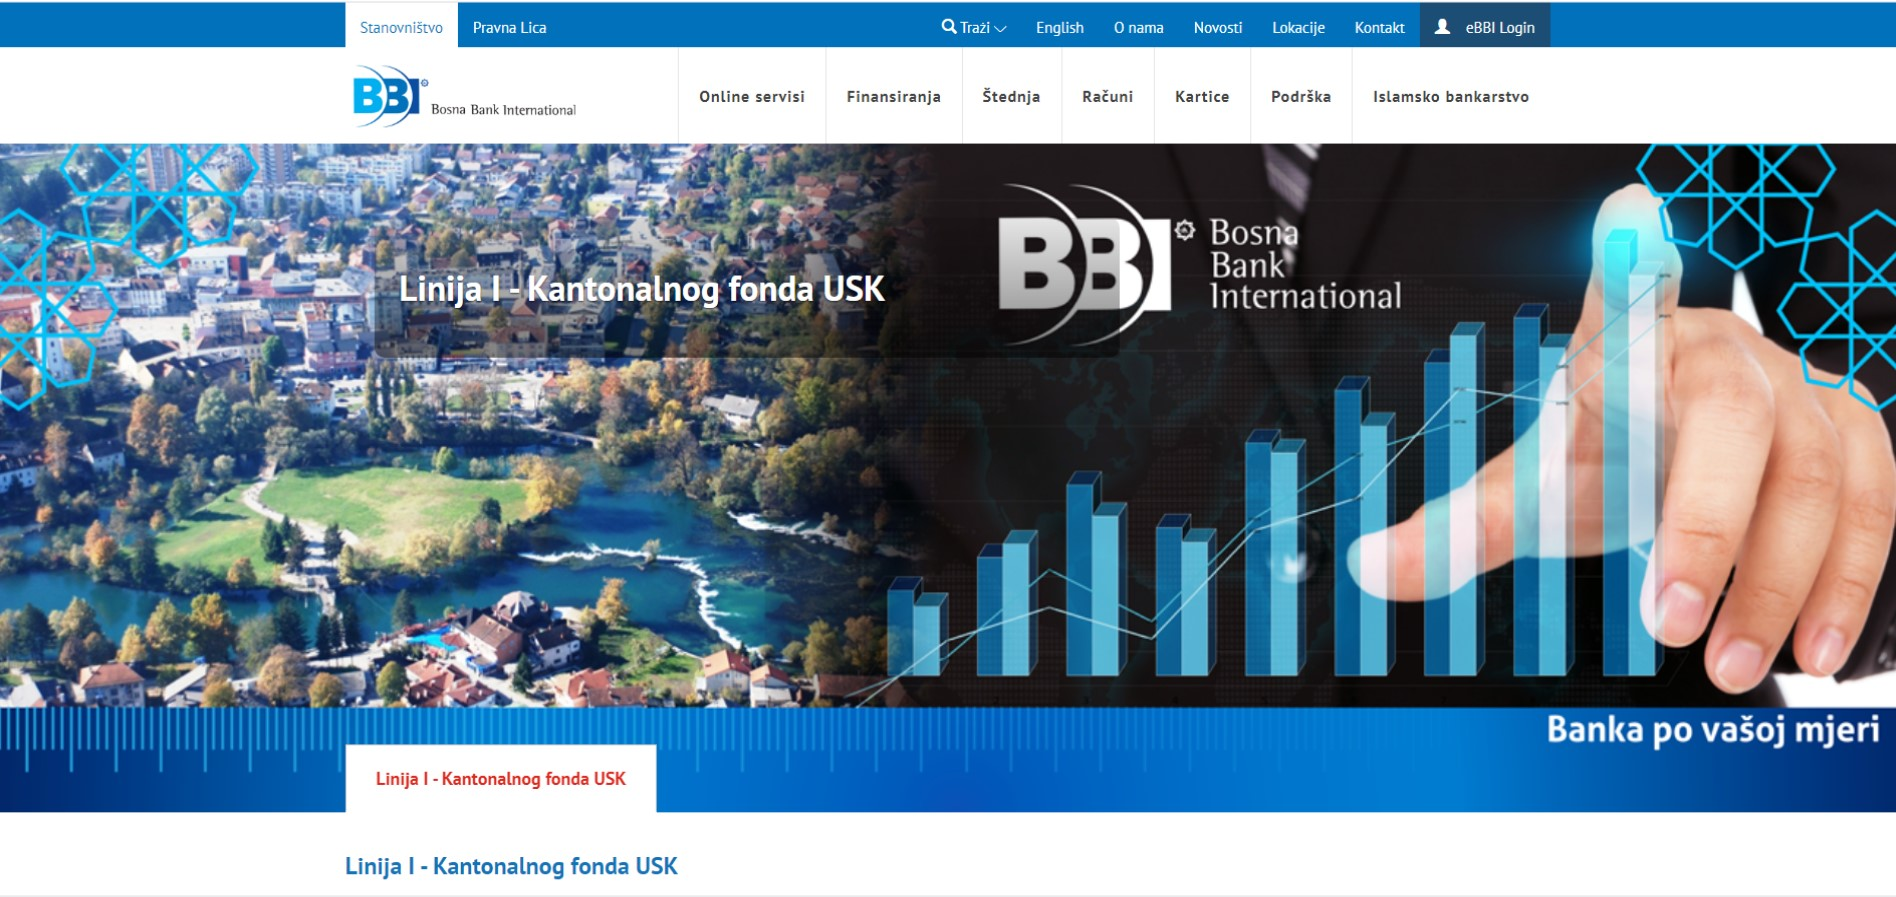 I Linija finansiranja – Bosna Bank International